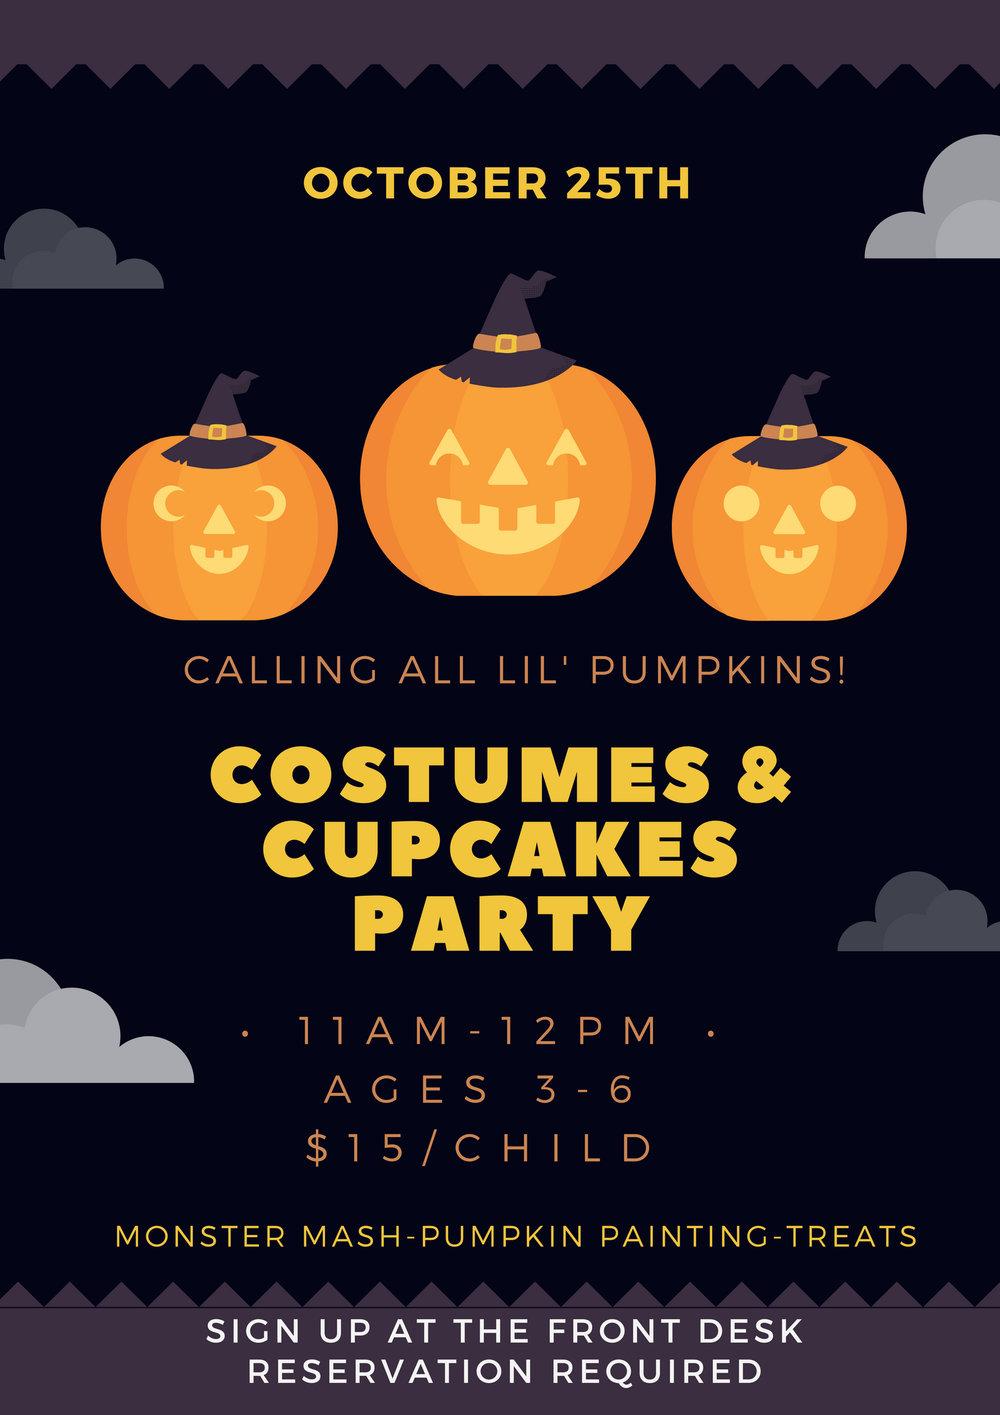 Costumes & Cupcakes.jpg